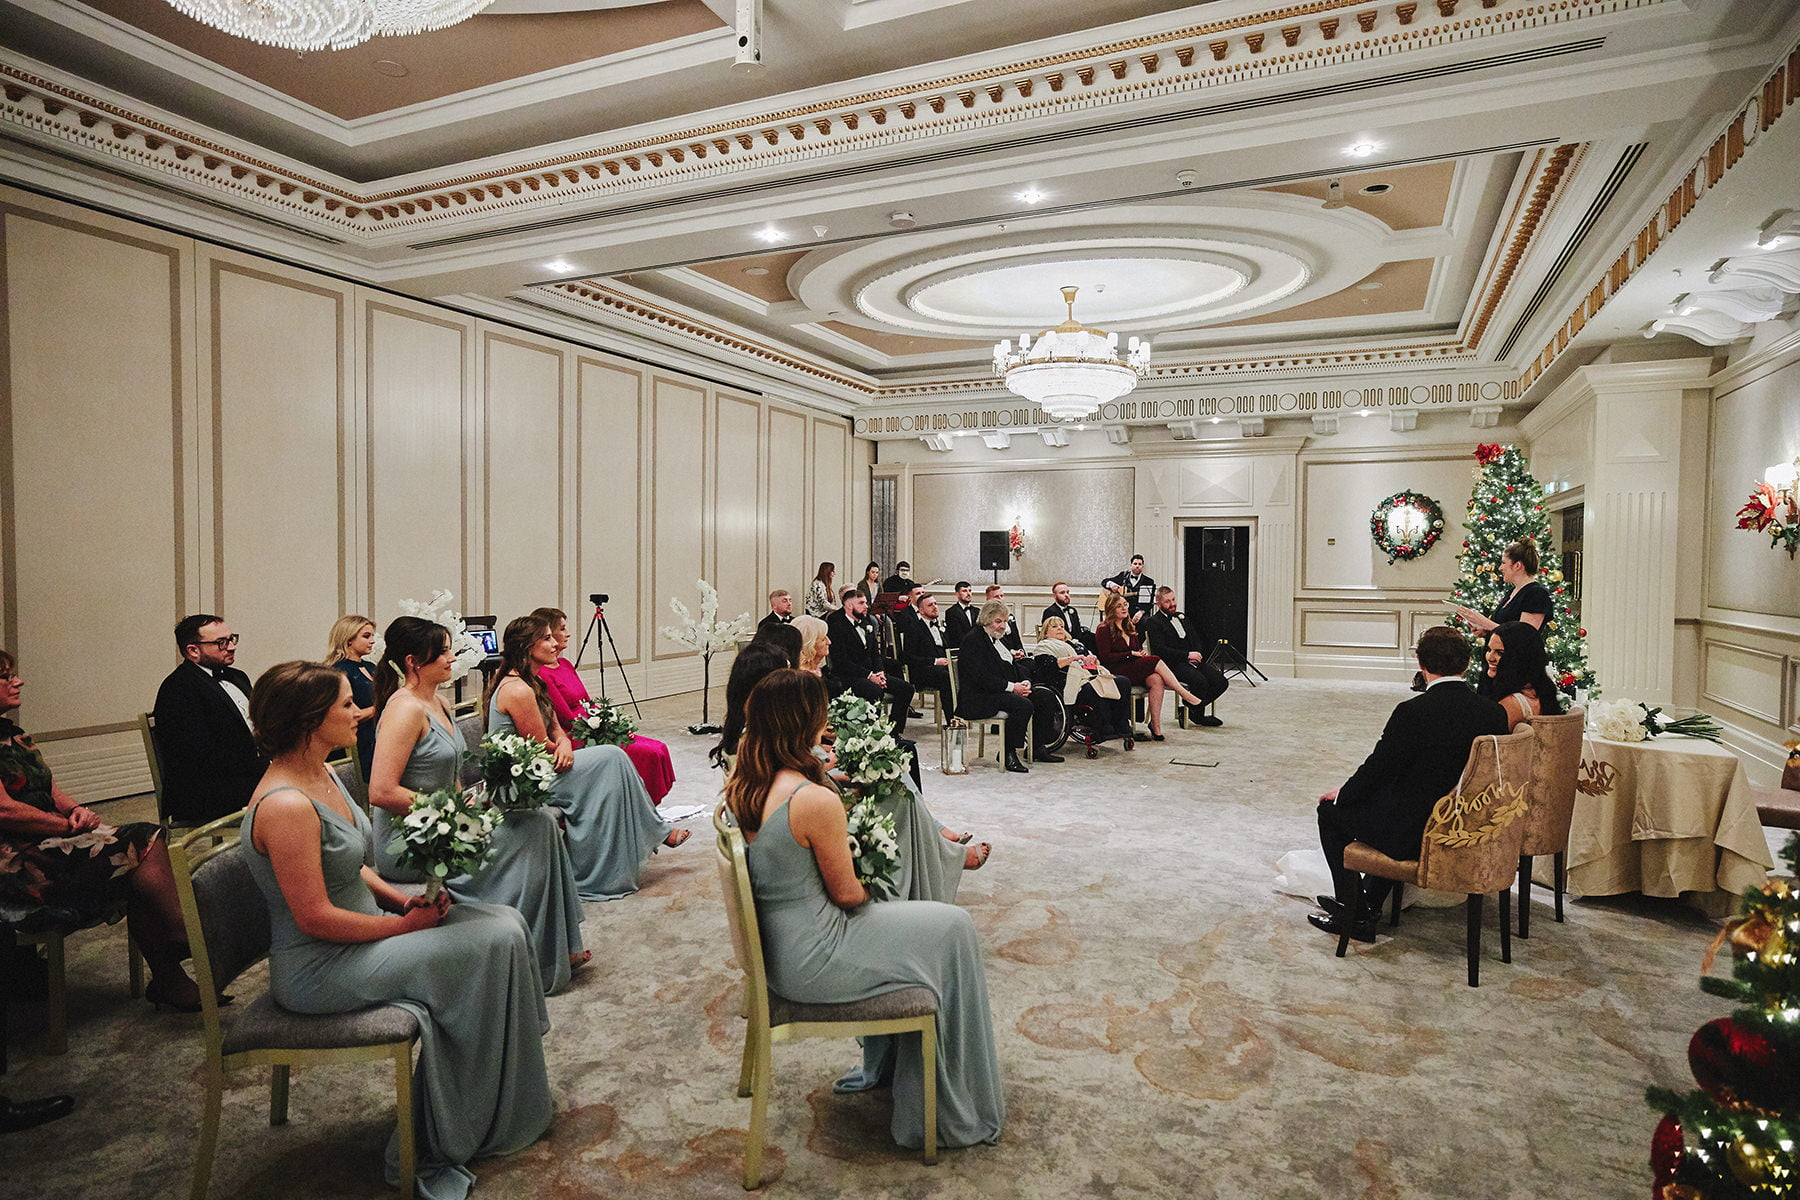 POWERSCOURT HOTEL RESORT INTIMATE WEDDING 45